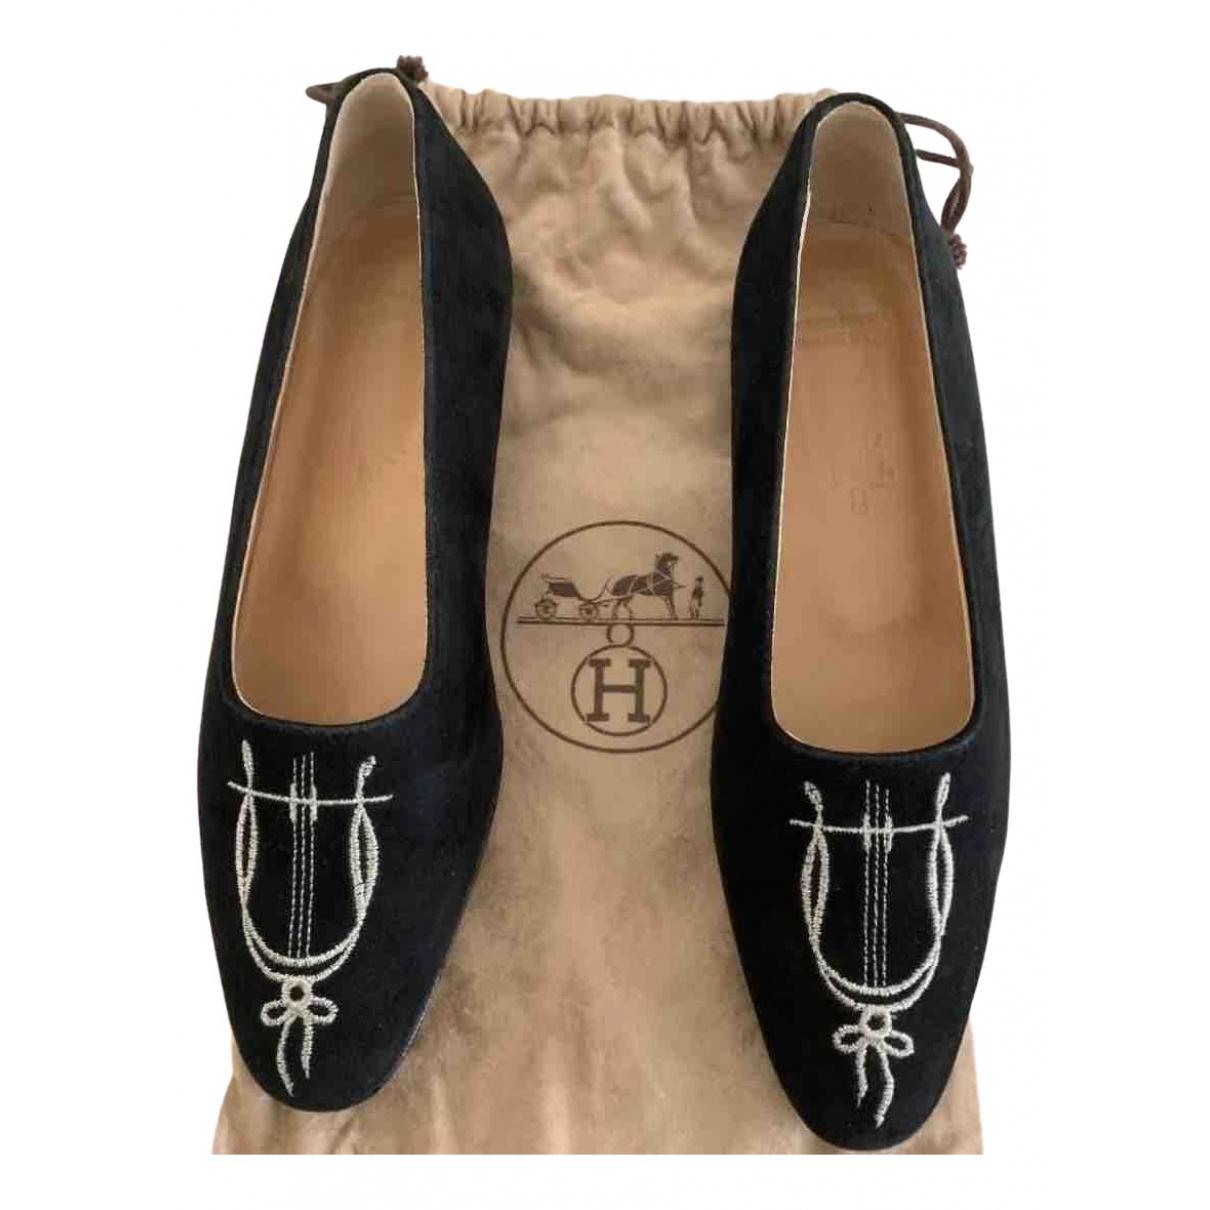 Hermès \N Black Suede Flats for Women 36.5 EU